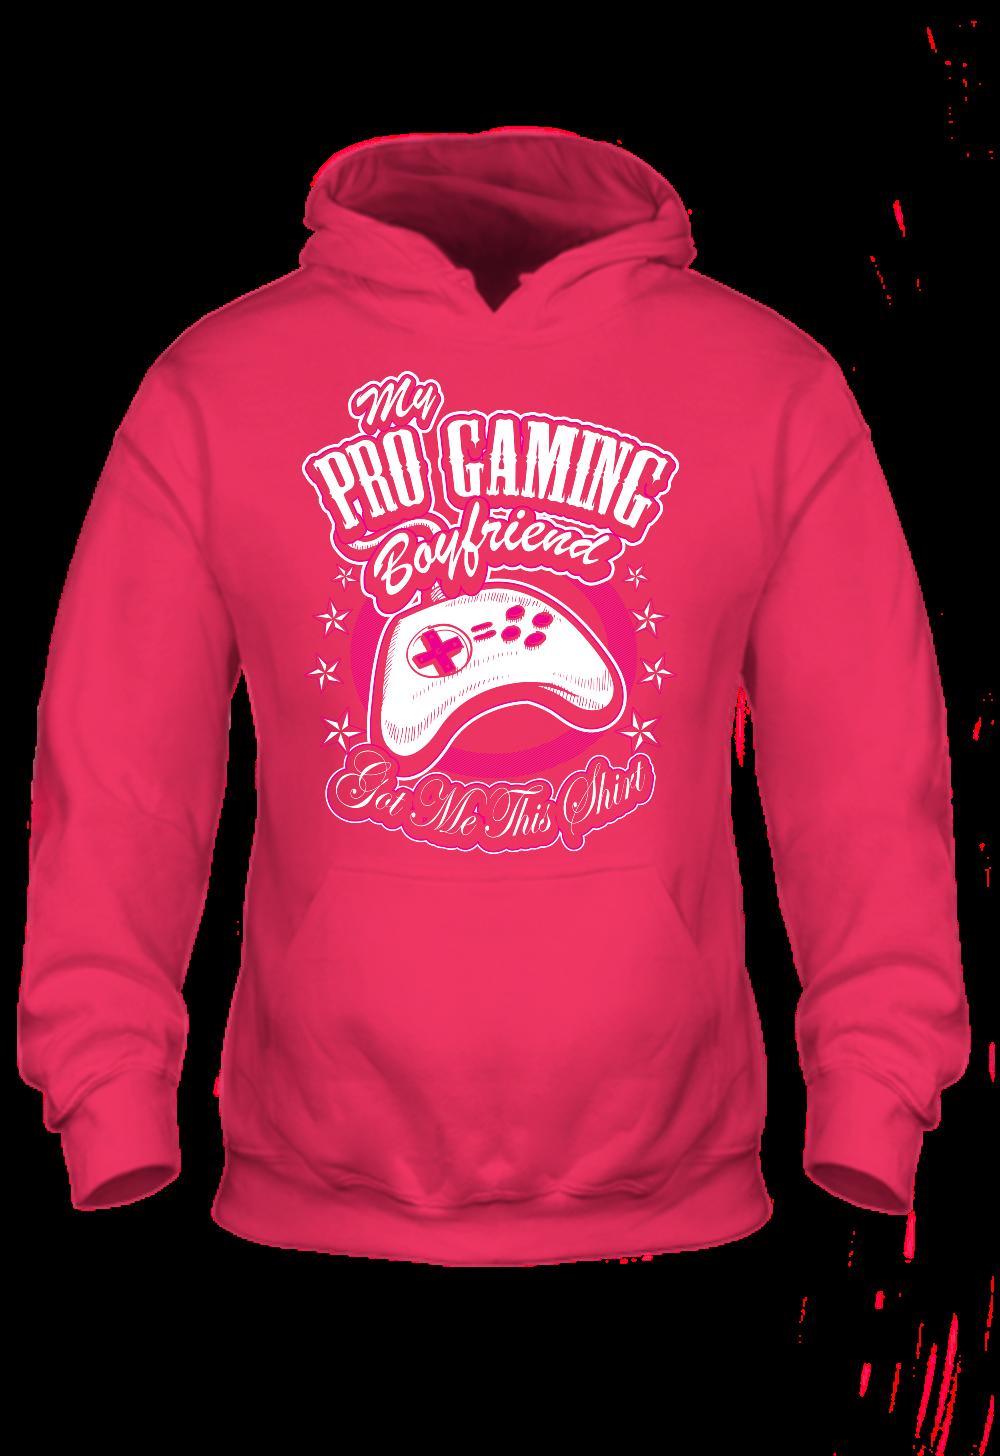 Pro Gaming bf Hoodie